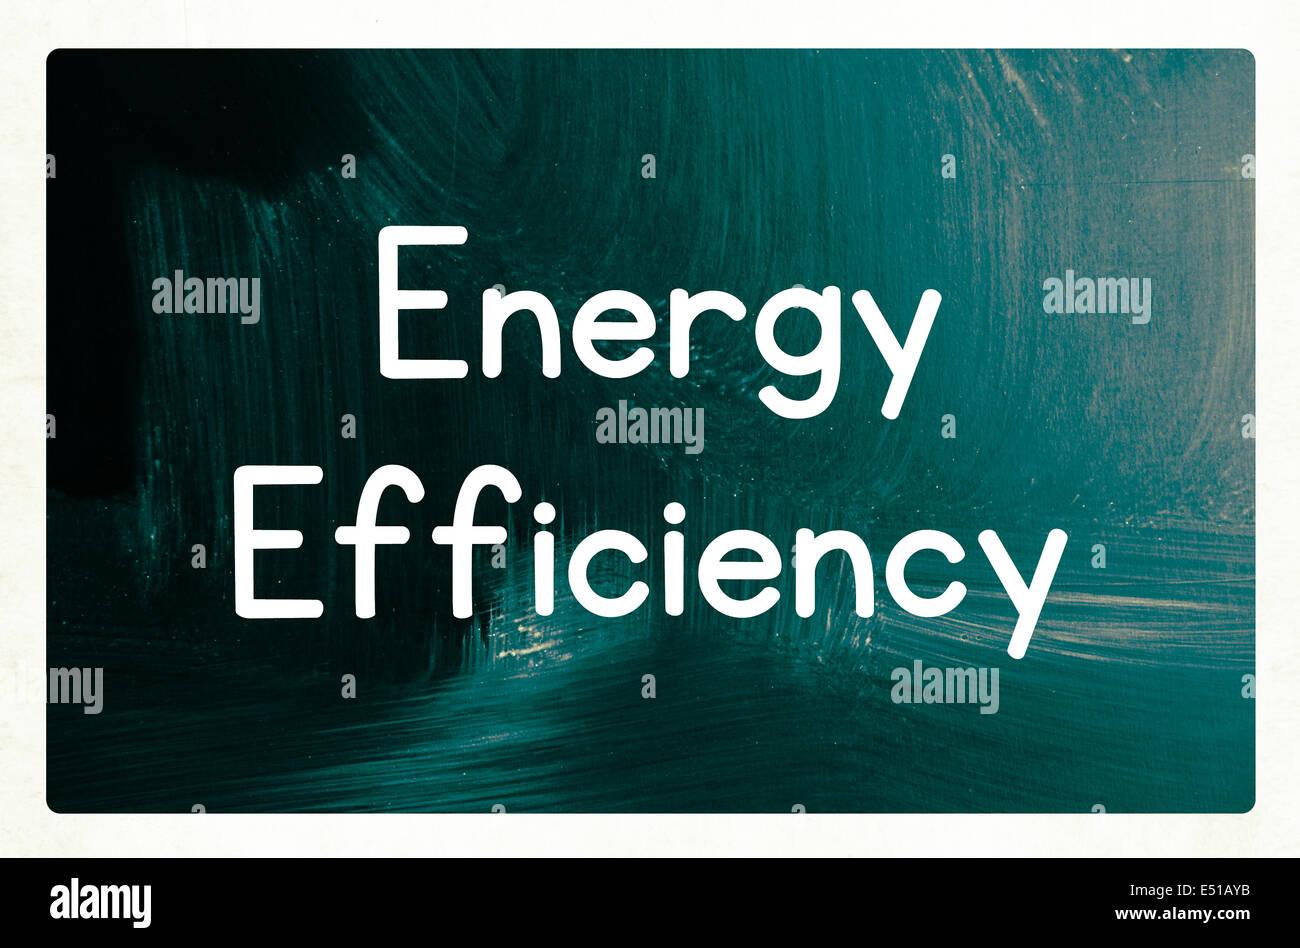 Concepto de eficiencia energética Imagen De Stock